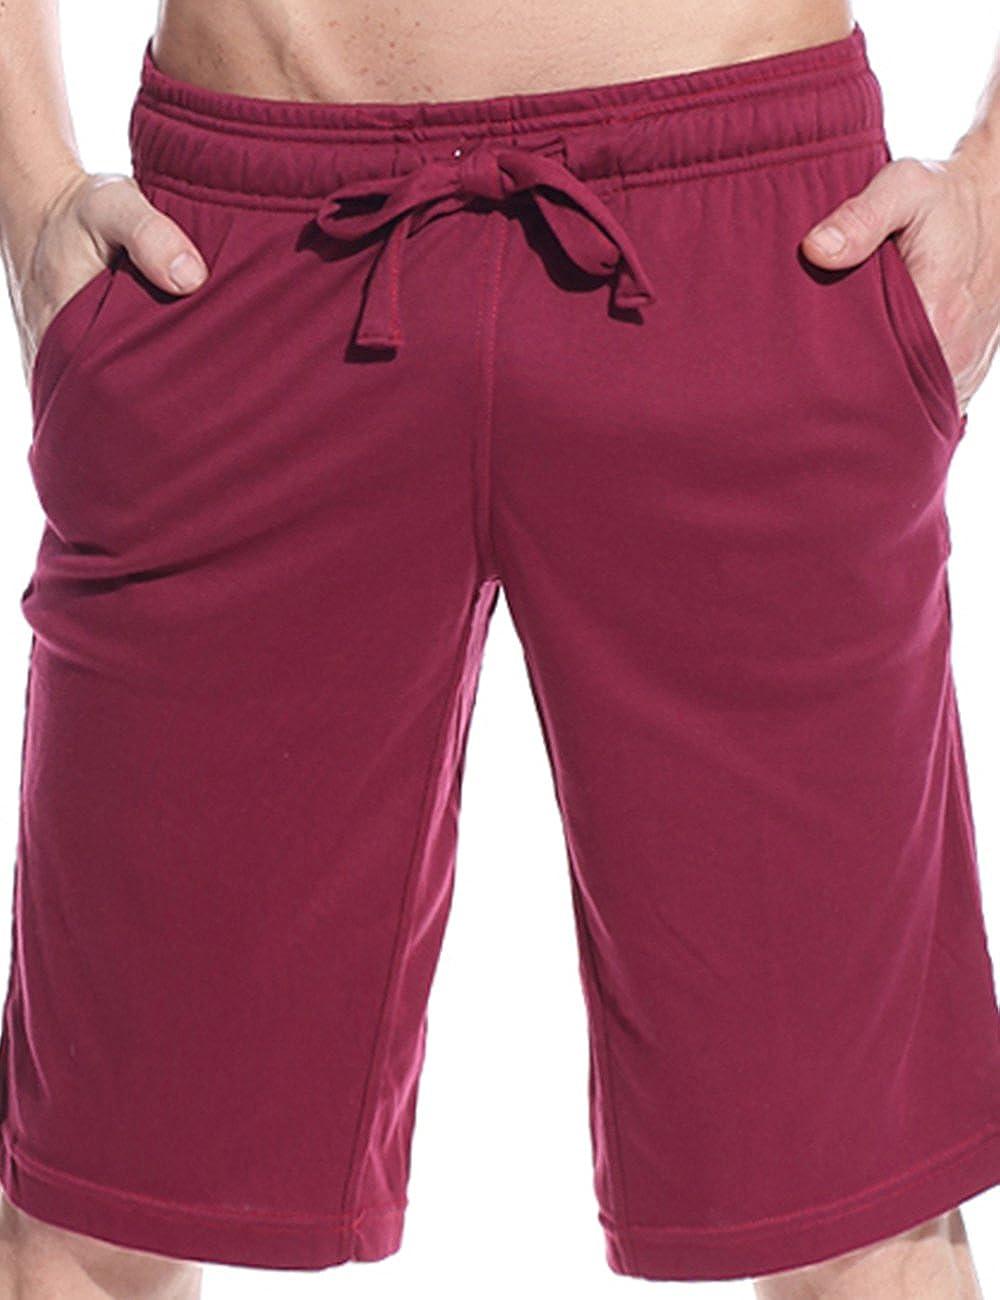 Godsen Men's Cotton Pajama Sleep Shorts with 2 Pockets 8211604-RG